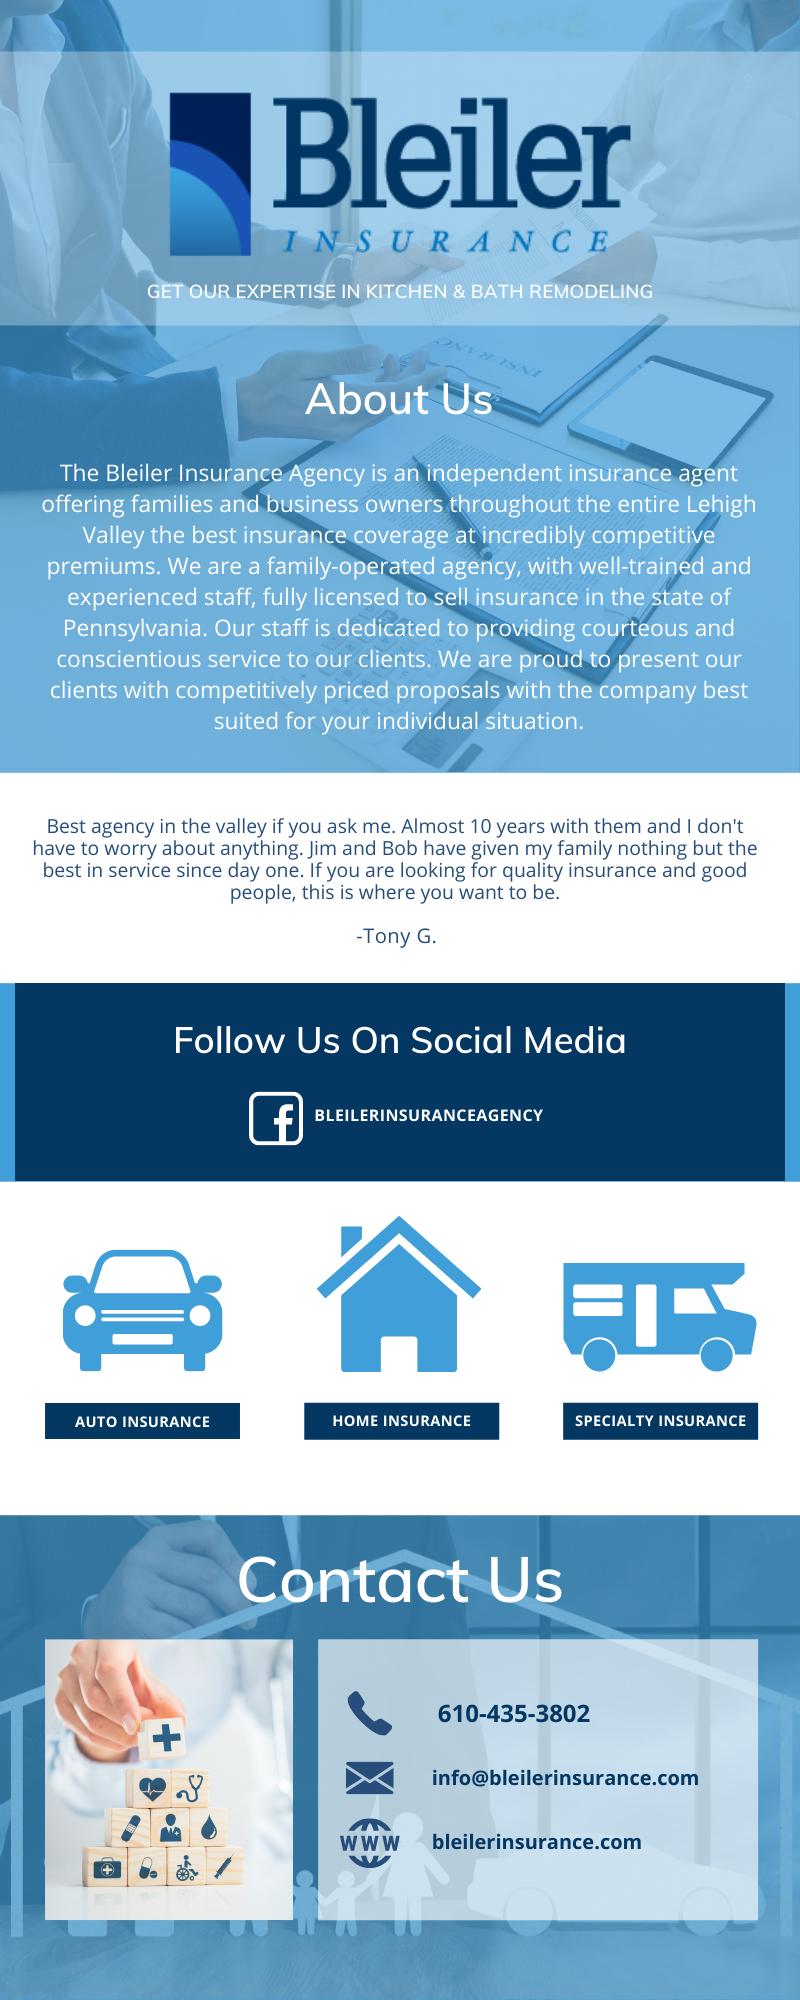 Bleiler Insurance Infographic May2021 2